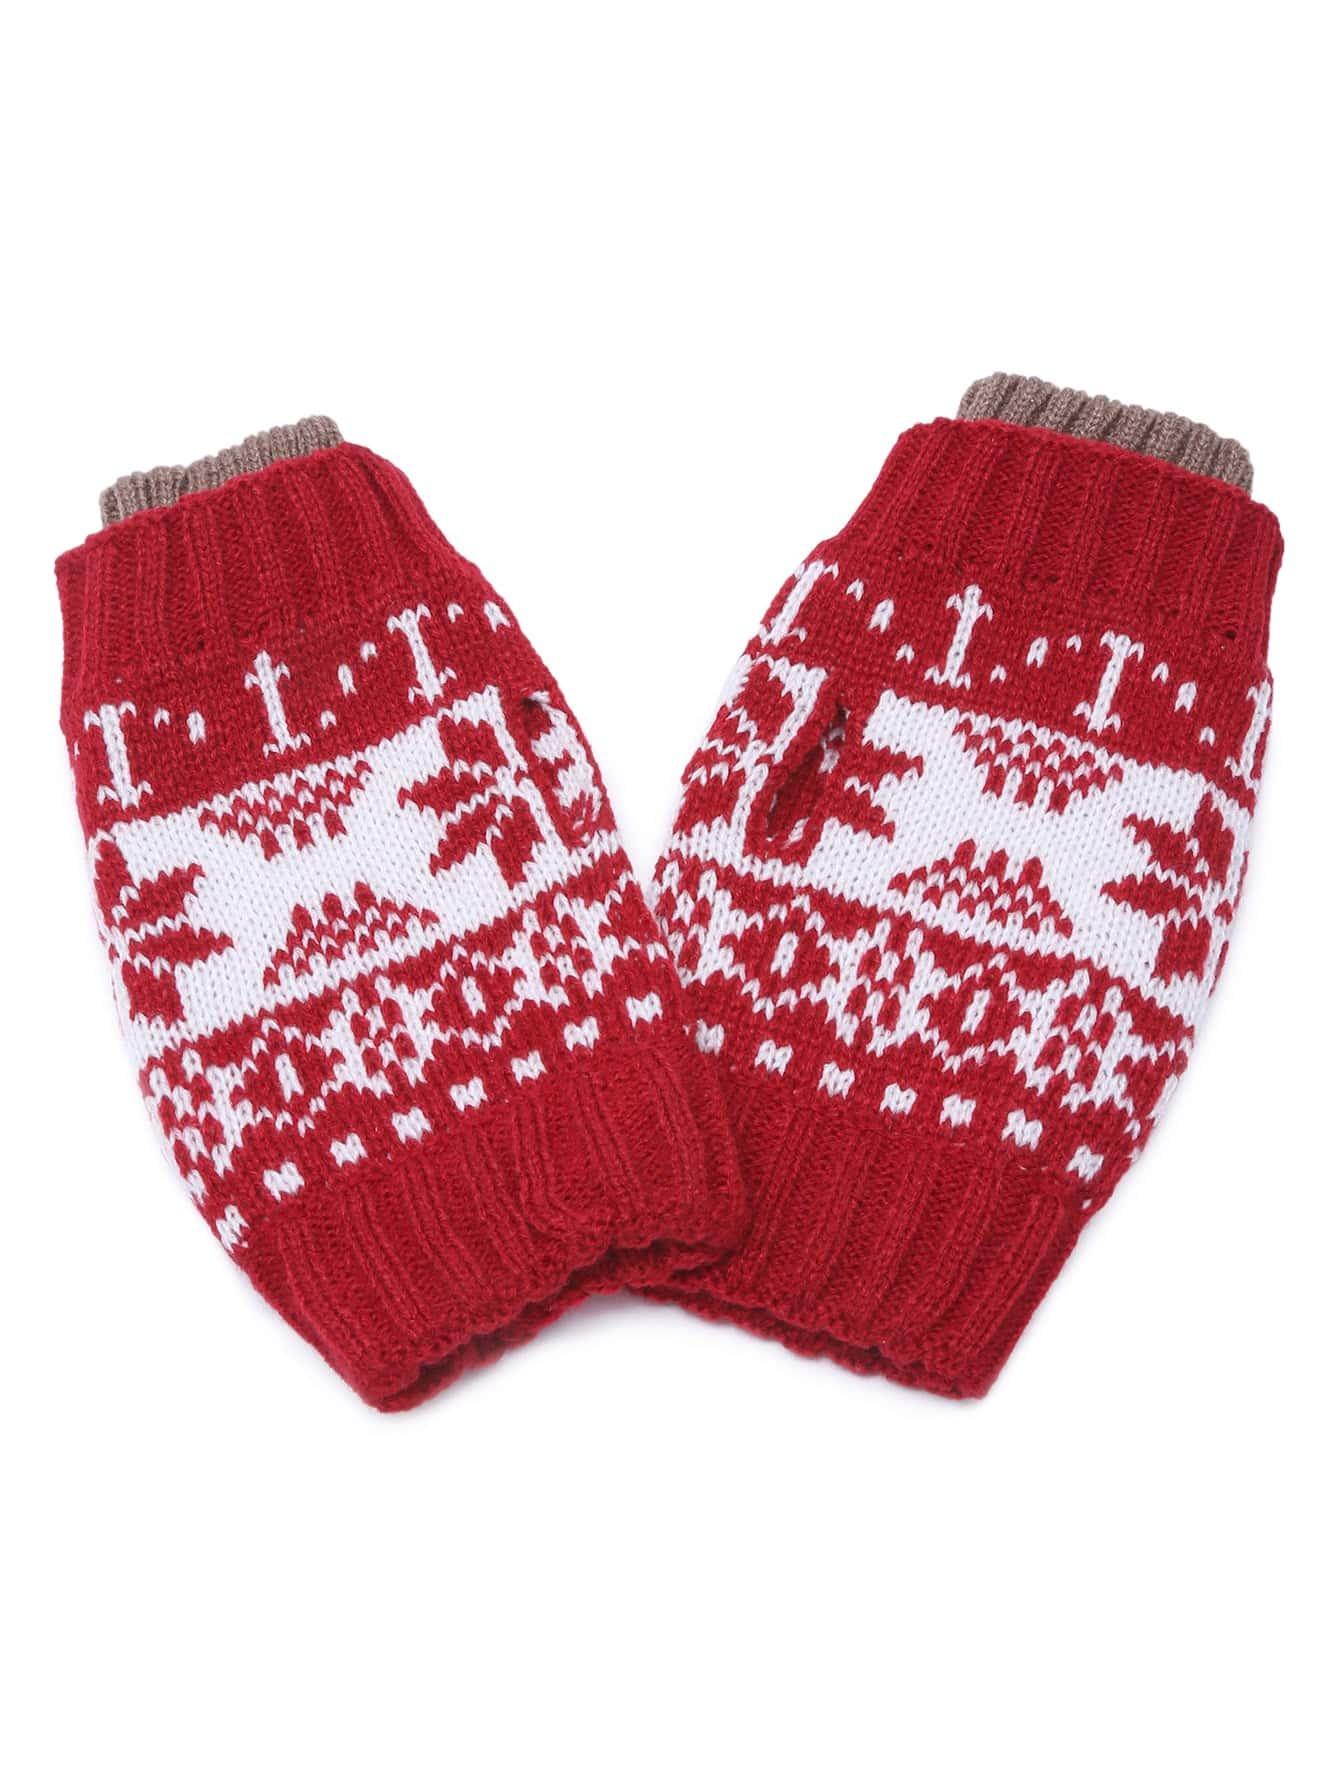 Фото Red Snowflake Fingerless Ribbed Knit Gloves. Купить с доставкой